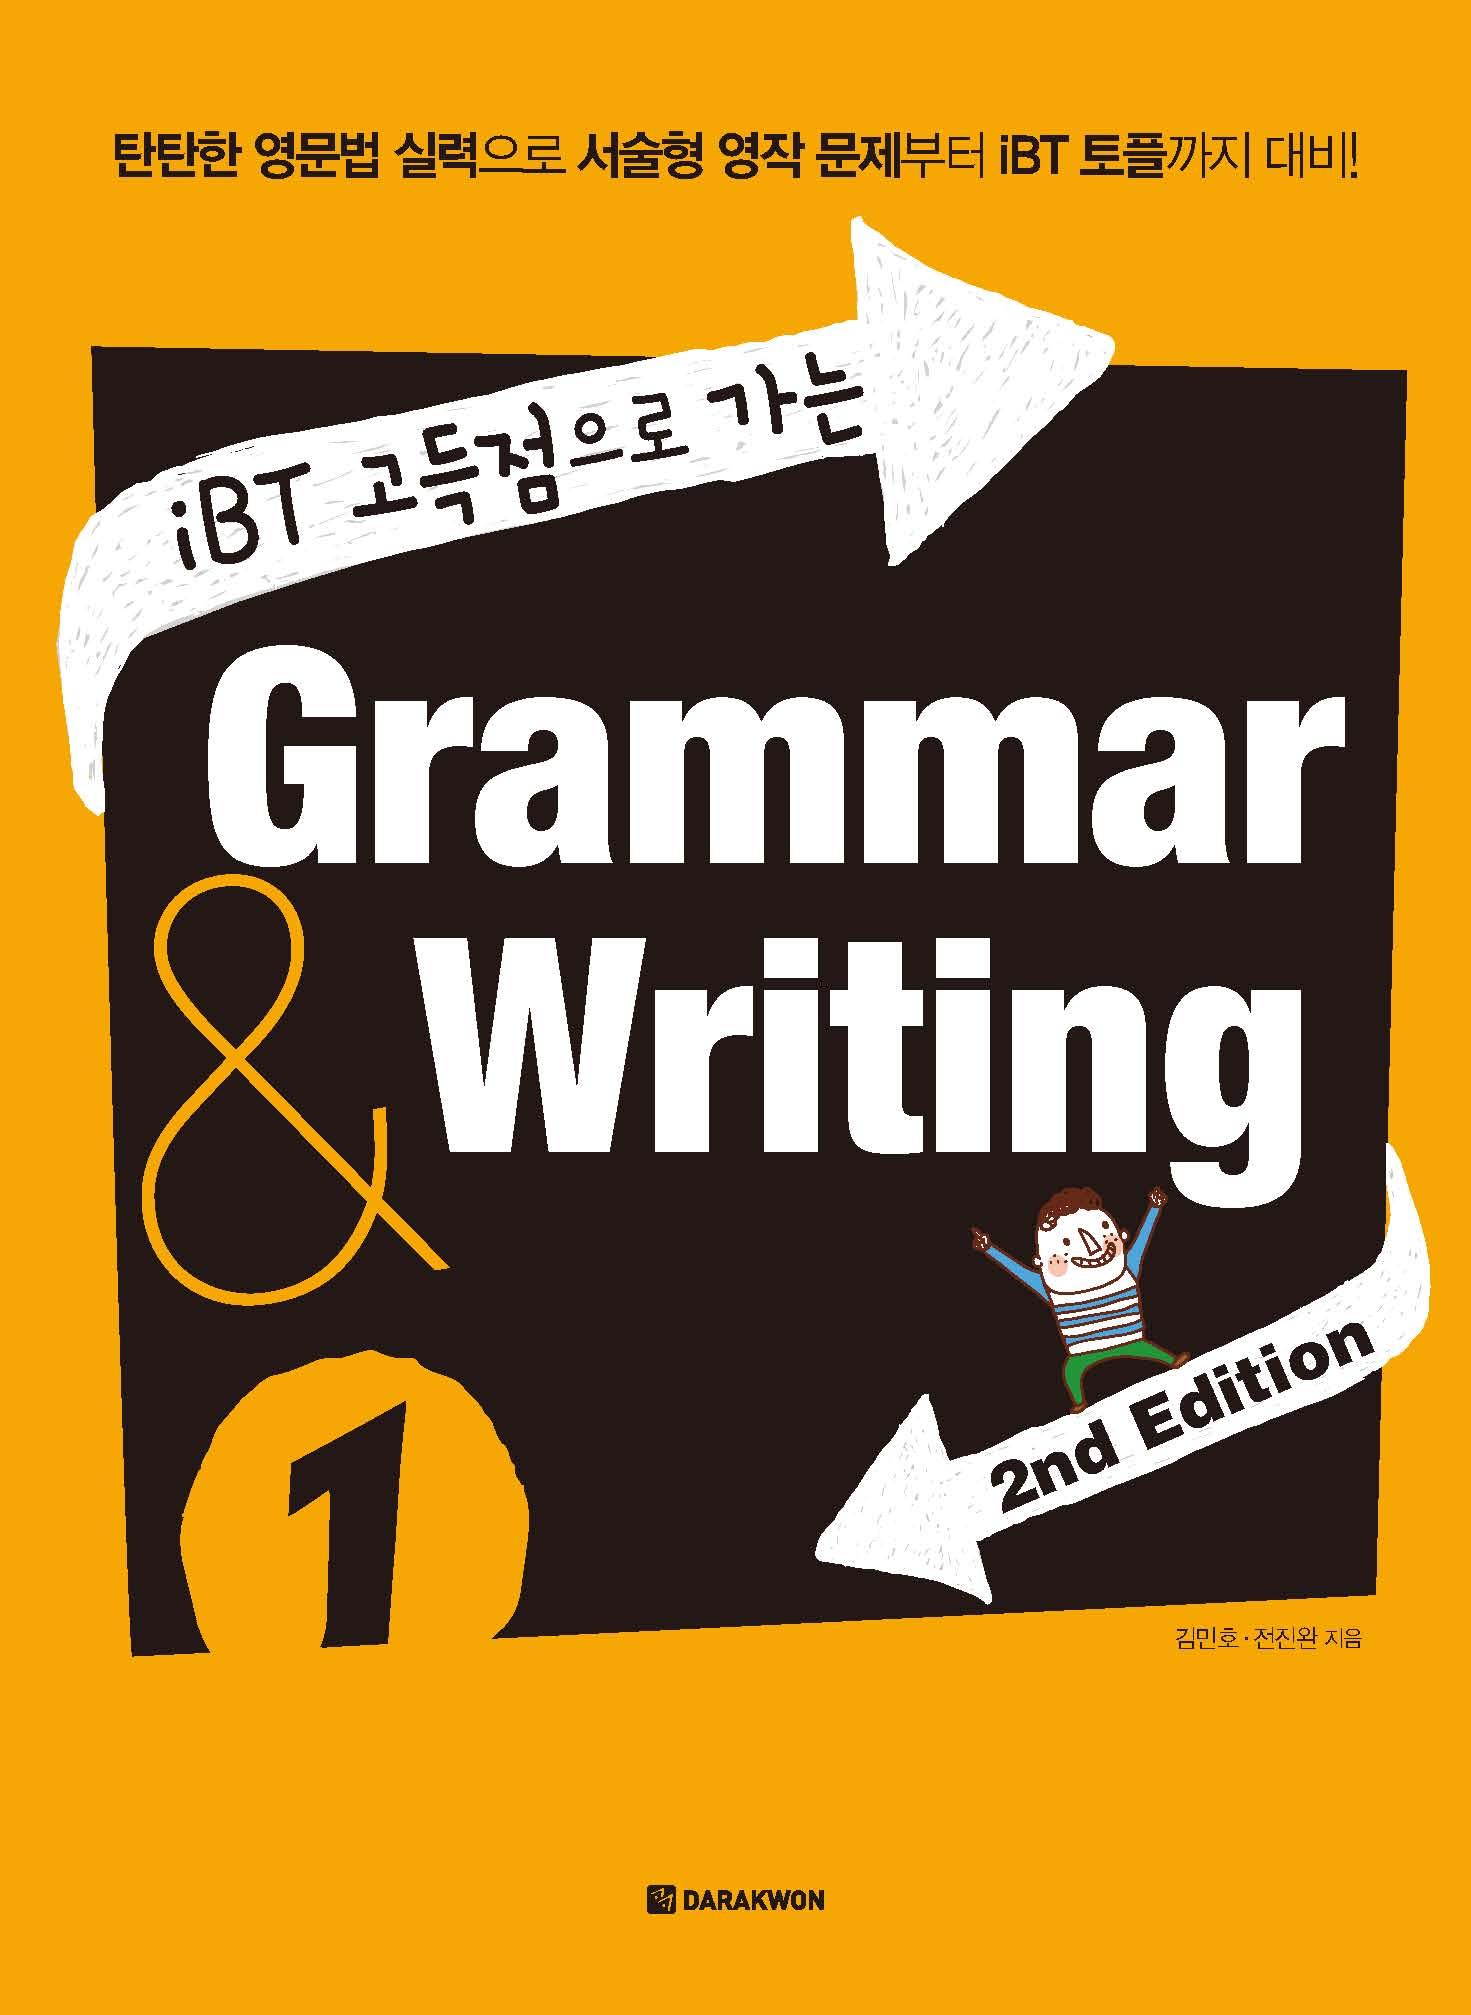 [iBT 고득점으로 가는 Grammar&Writing] (2nd Edition) iBT 고득점으로 가는 Grammar&Writing 1